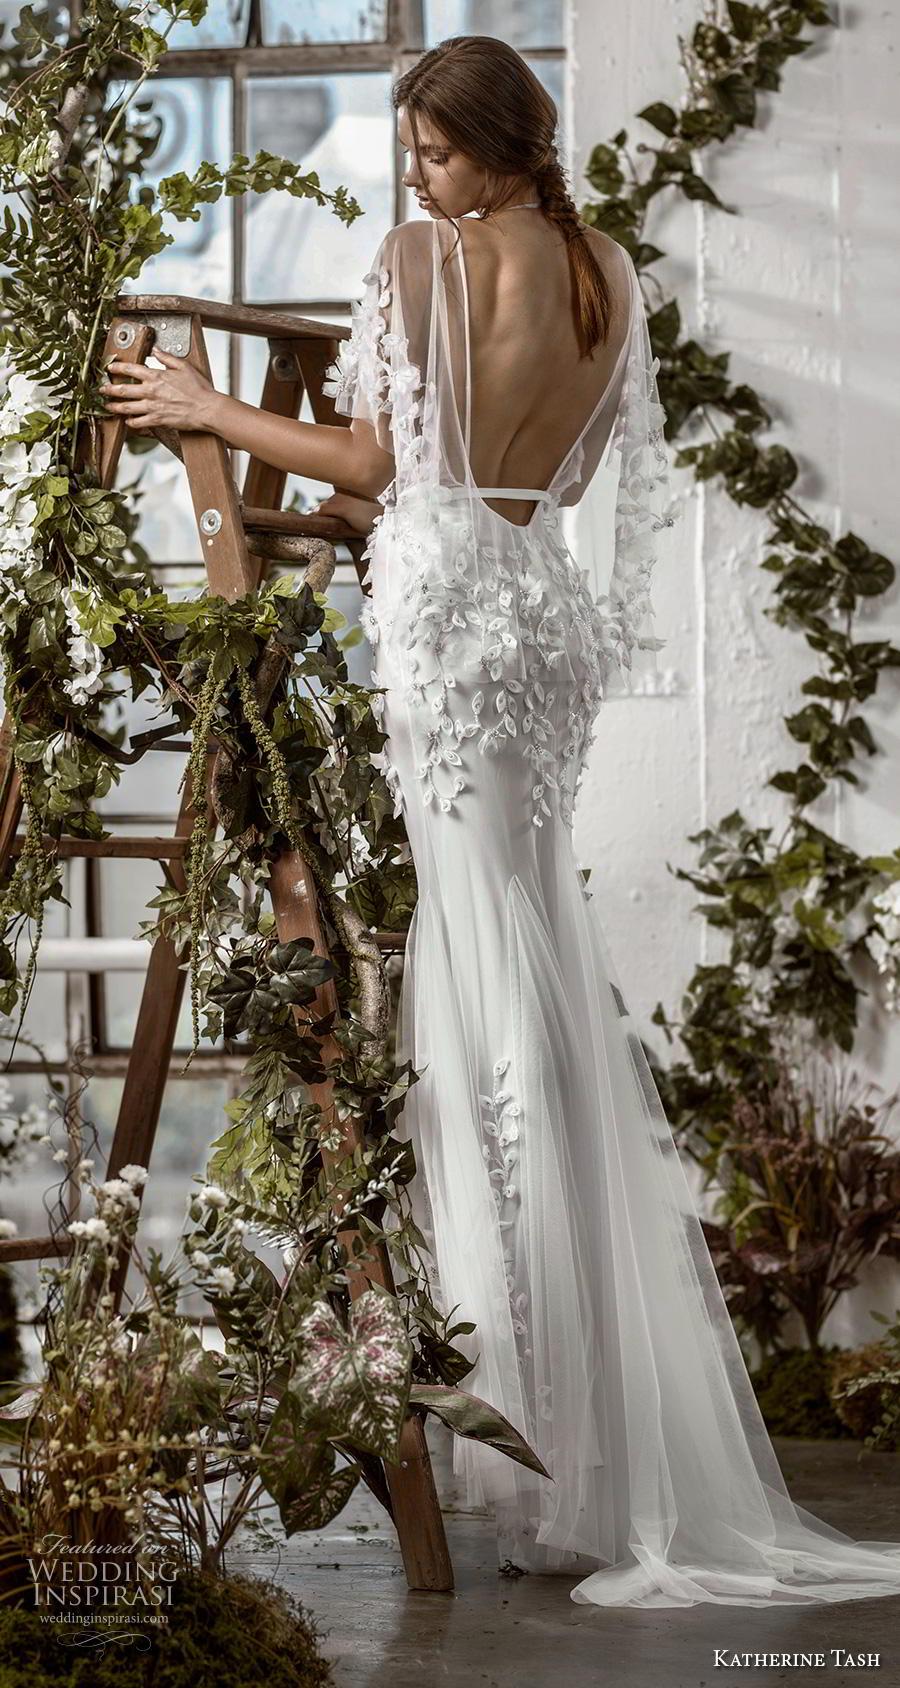 katherine tash fall 2019 bridal half kimino sleeves deep v neck heavily embellished bodice sexy fit and flare wedding dress backless sweep train (1) bv